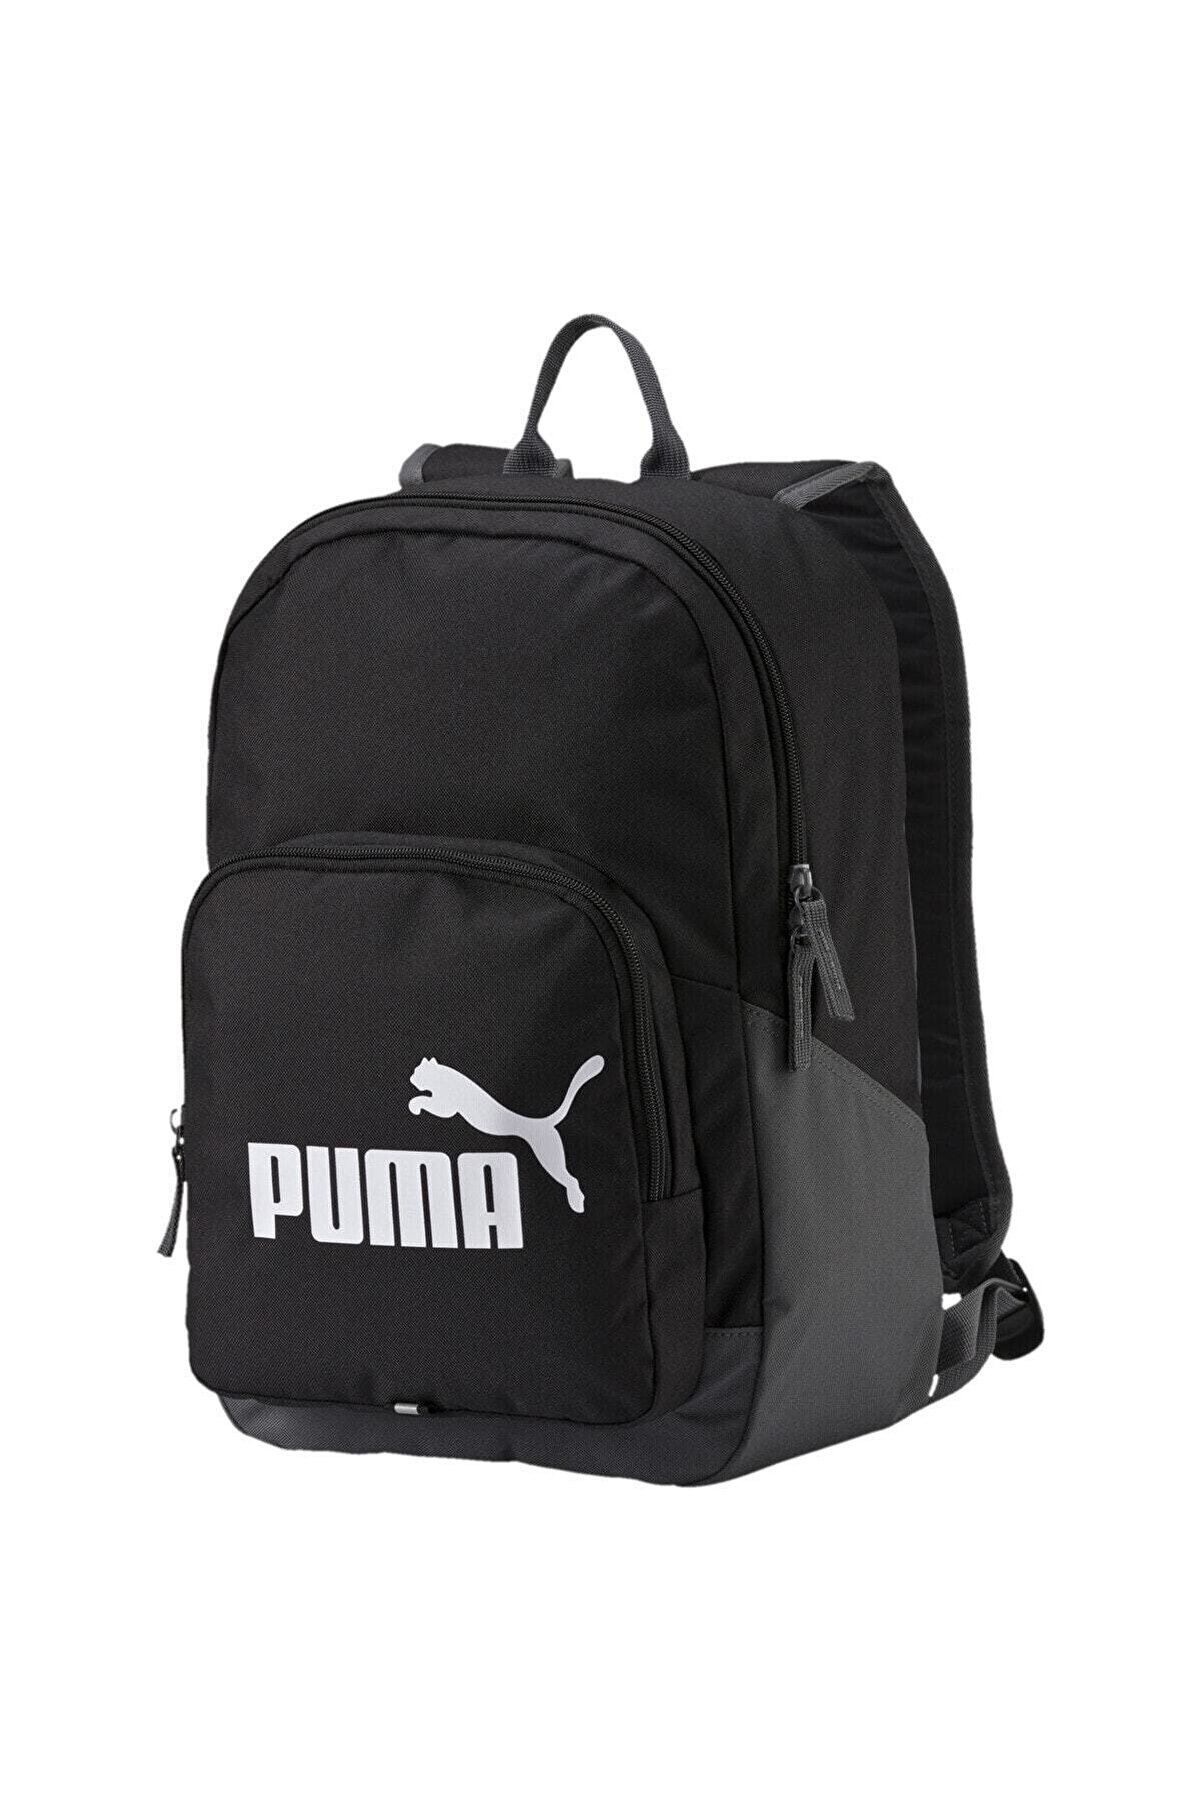 Puma Phase Sırt Çantası